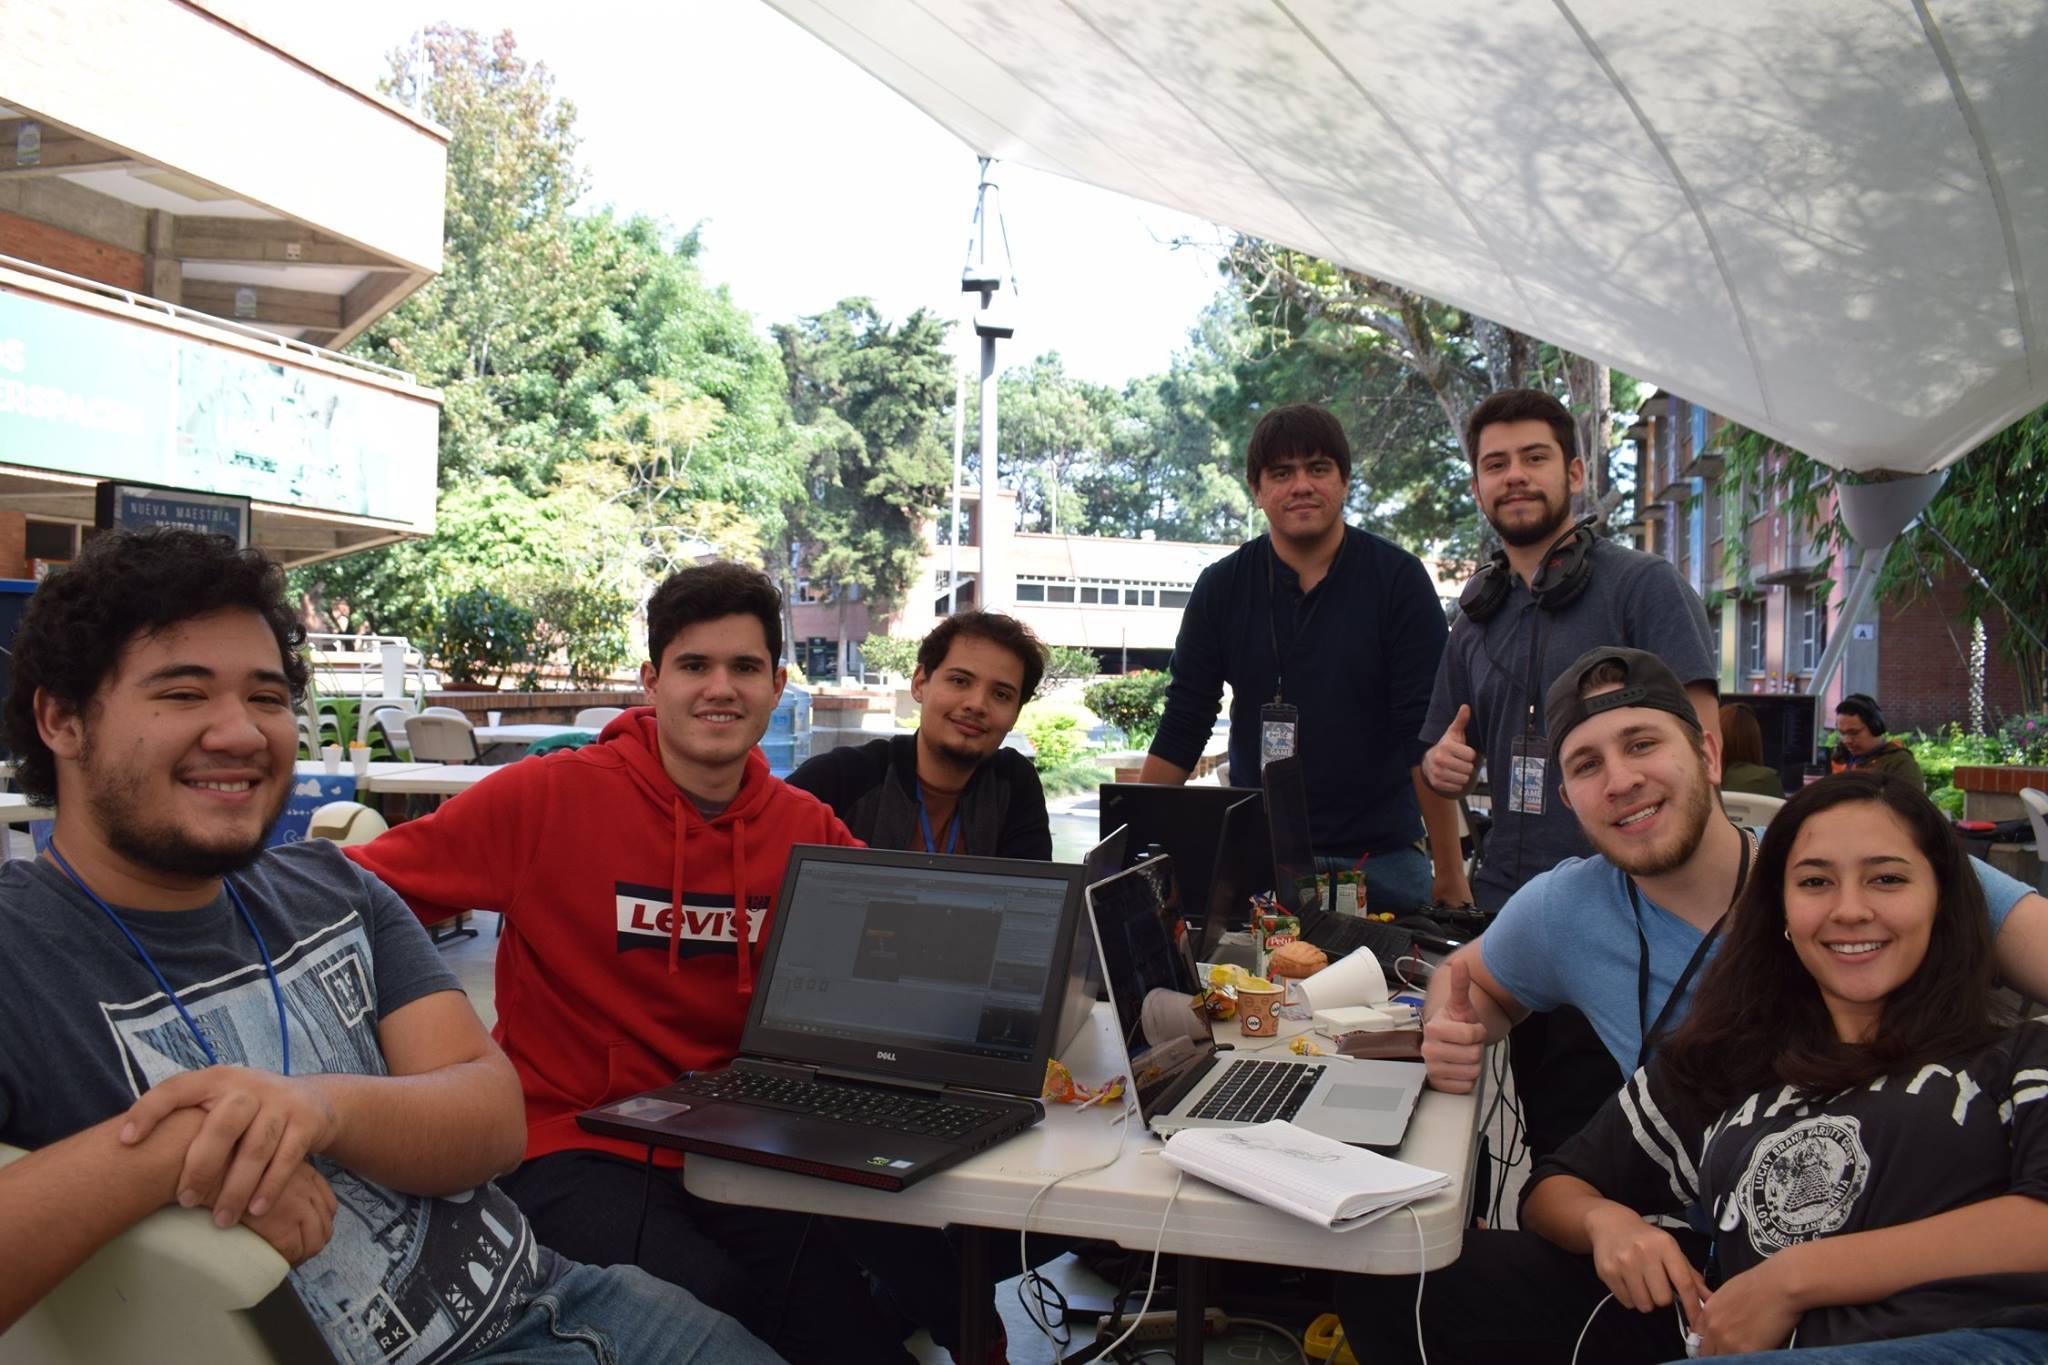 Jóvenes participantes del evento mundial Global Game Jam 2019.  (Foto Prensa Libre: UVG)